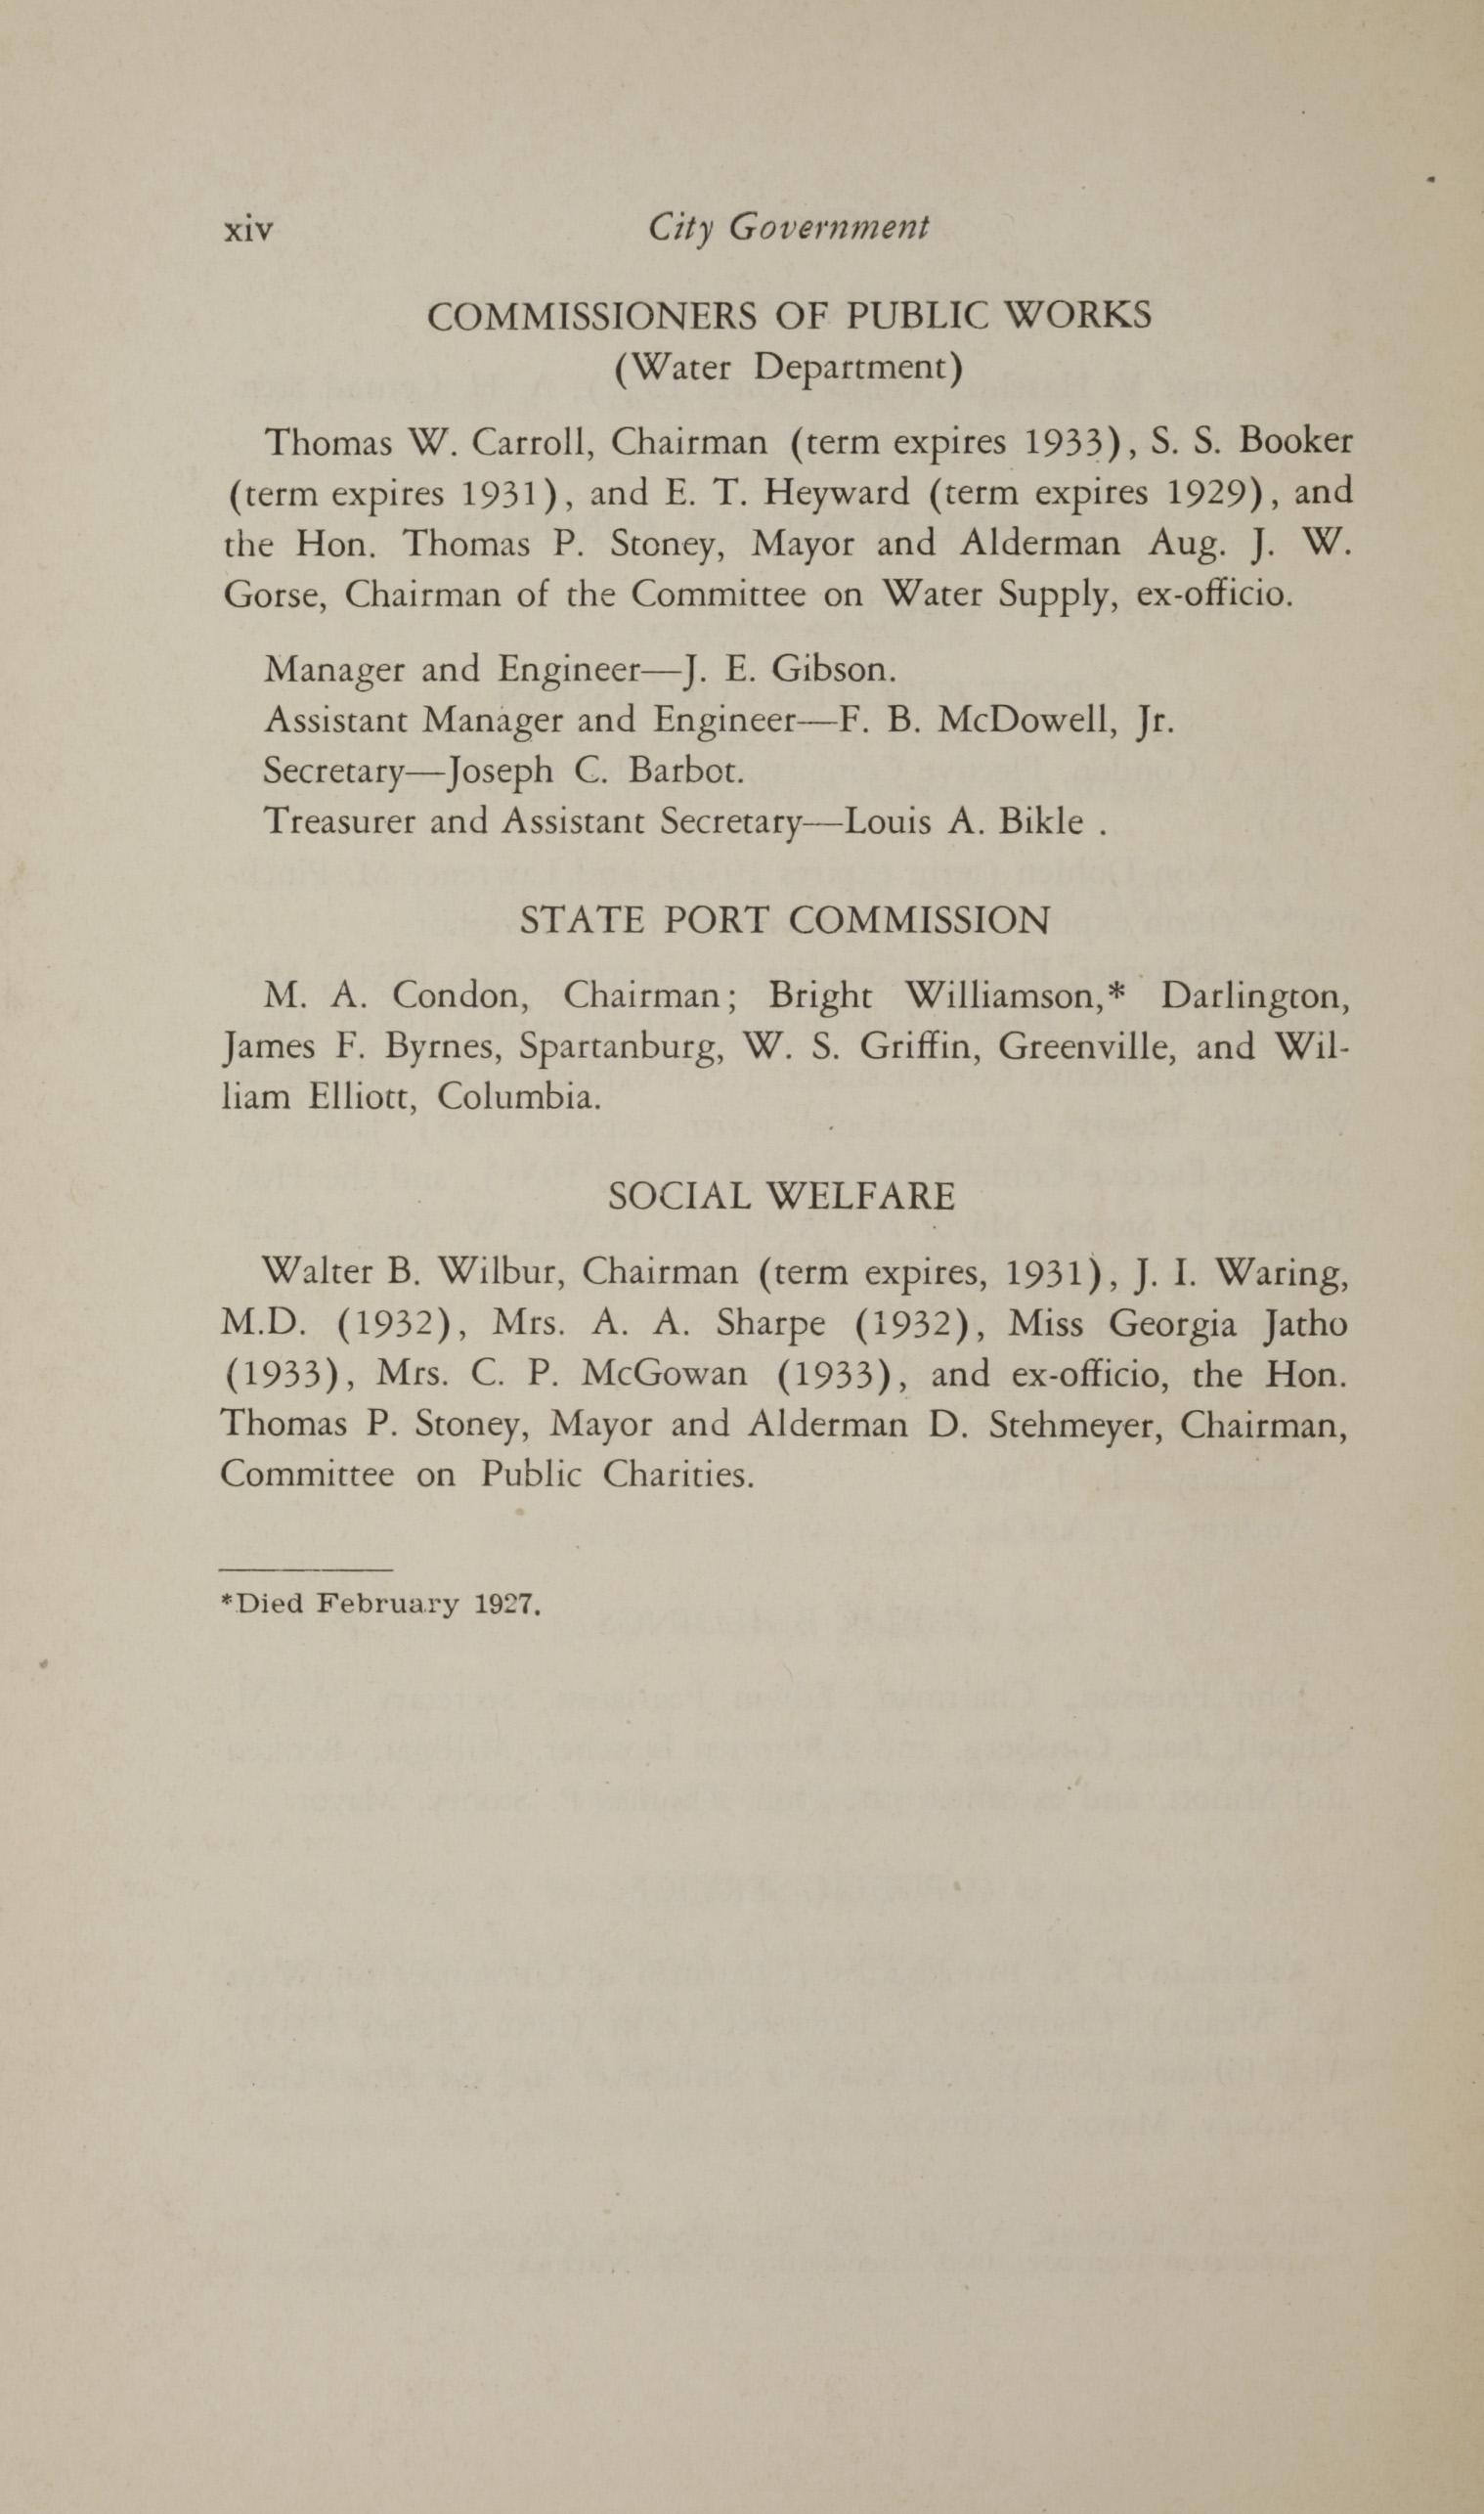 Charleston Yearbook, 1930, page xiv